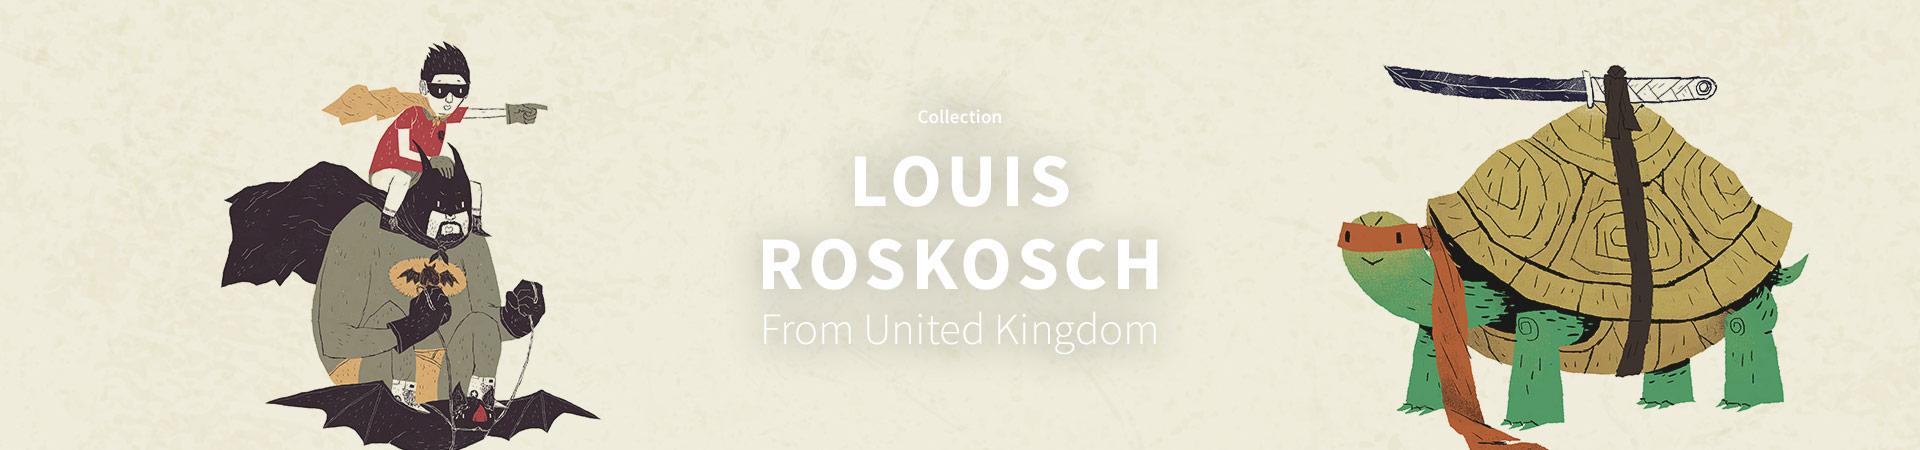 Louis Roskosch